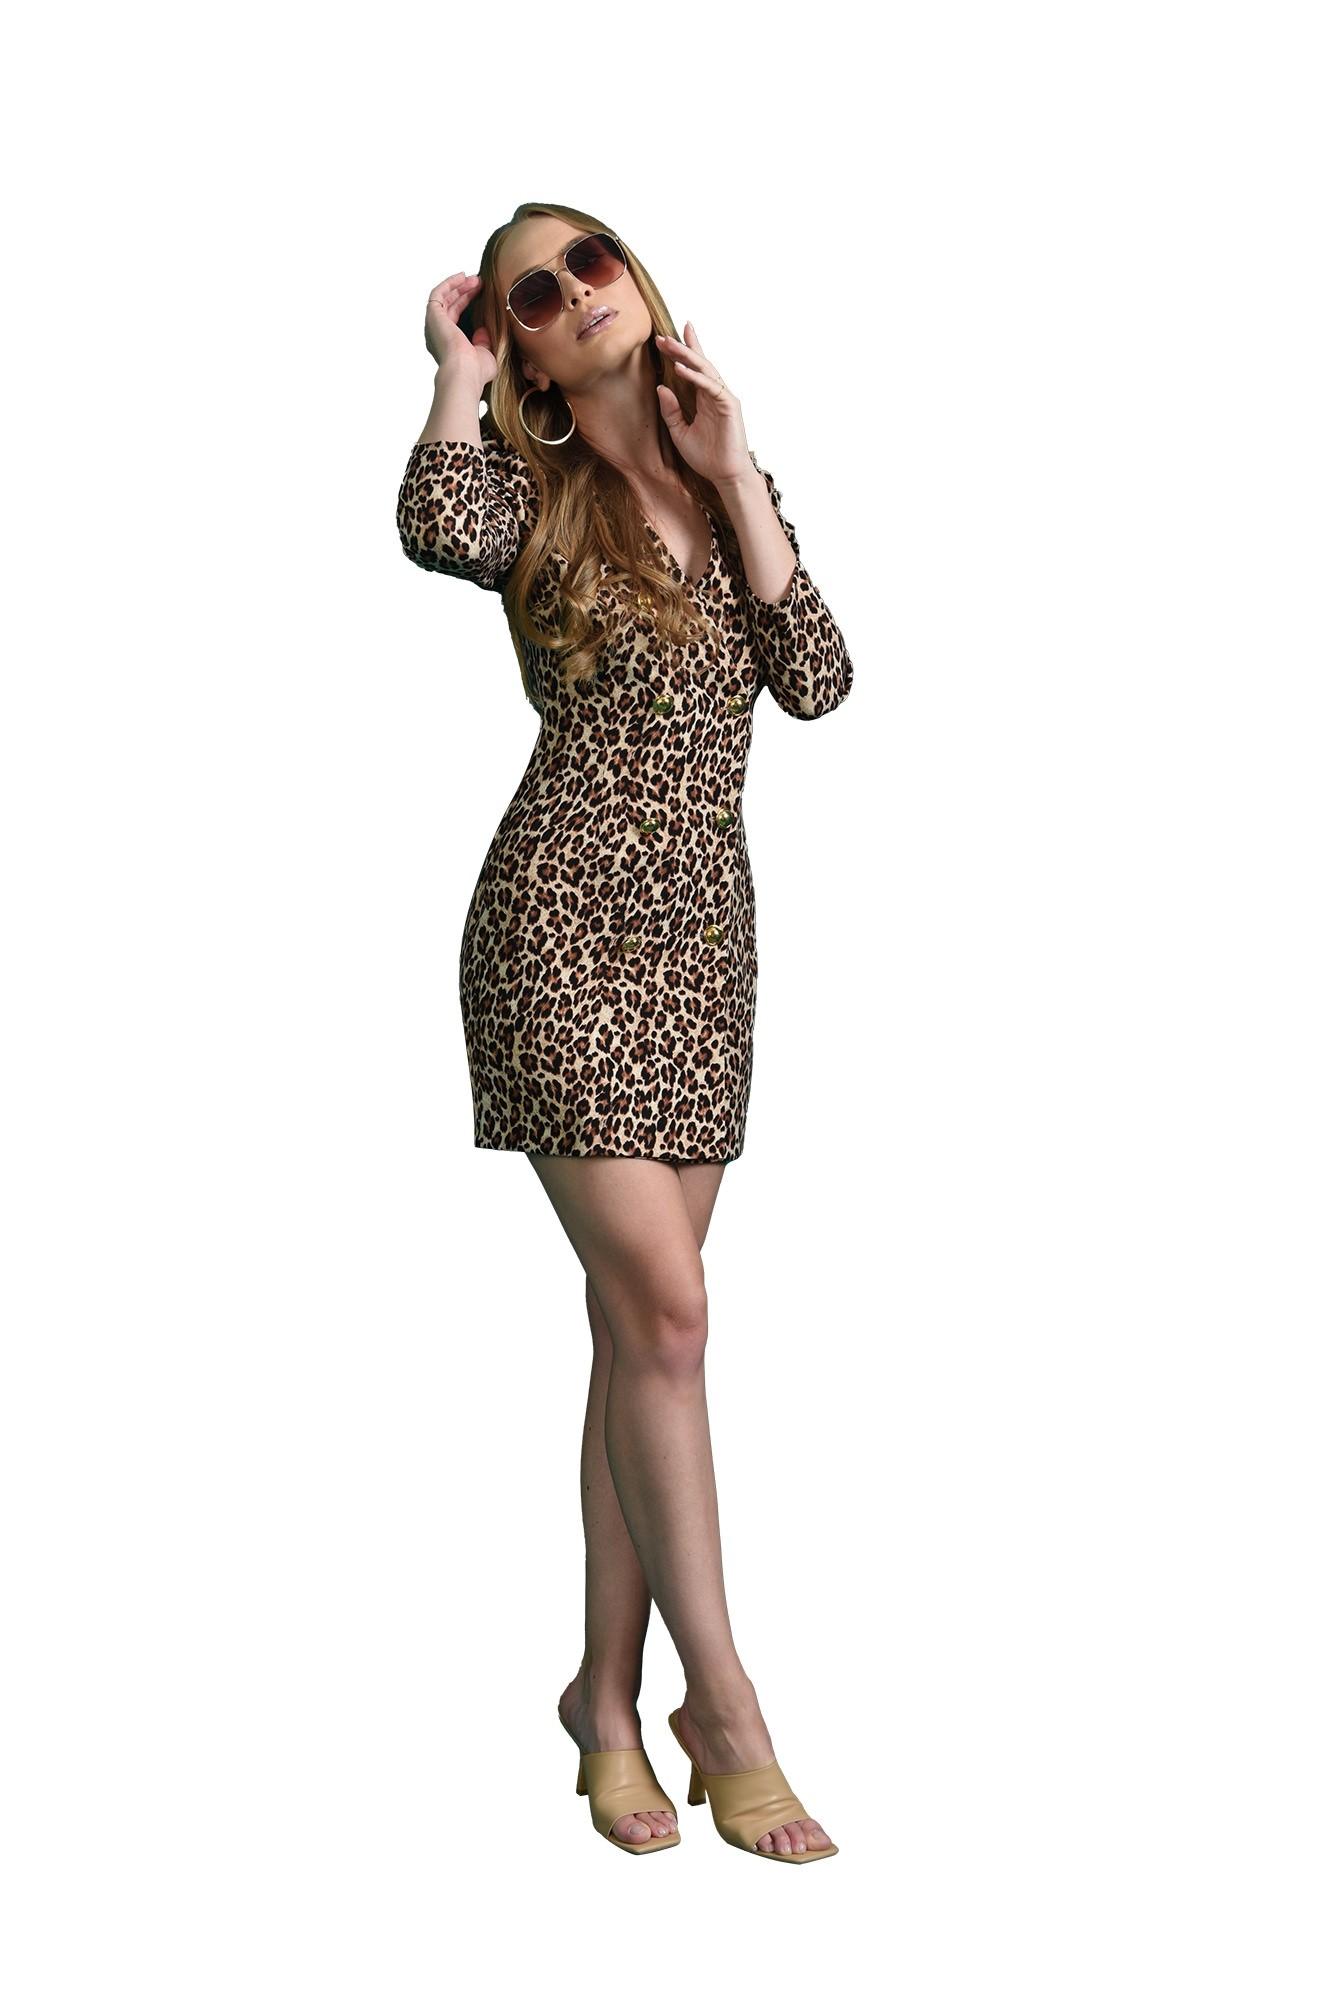 3 - rochie mini, animal print, cu umeri accentuati